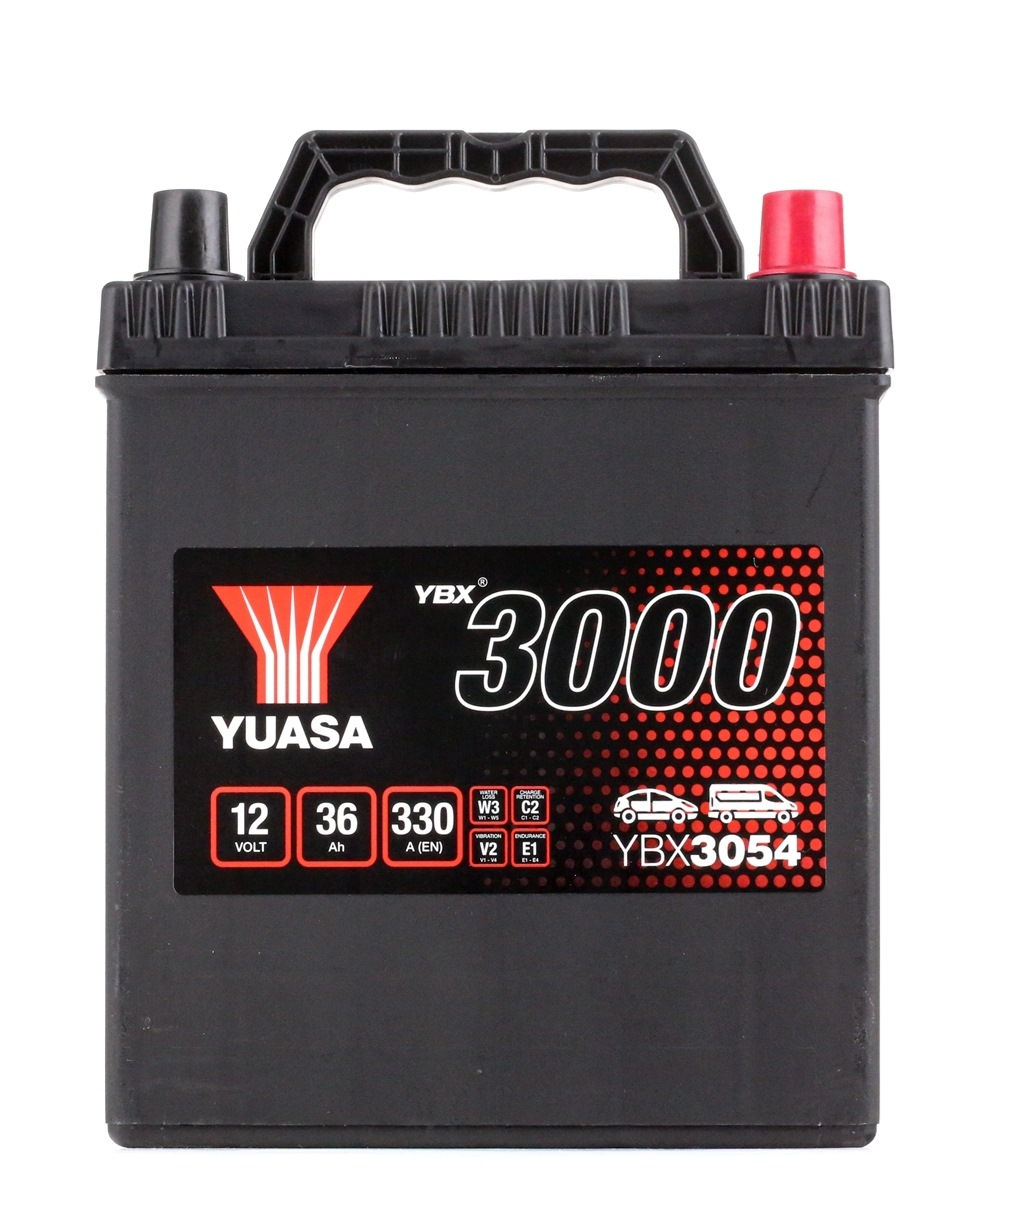 Akku YUASA YBX3054 Bewertung